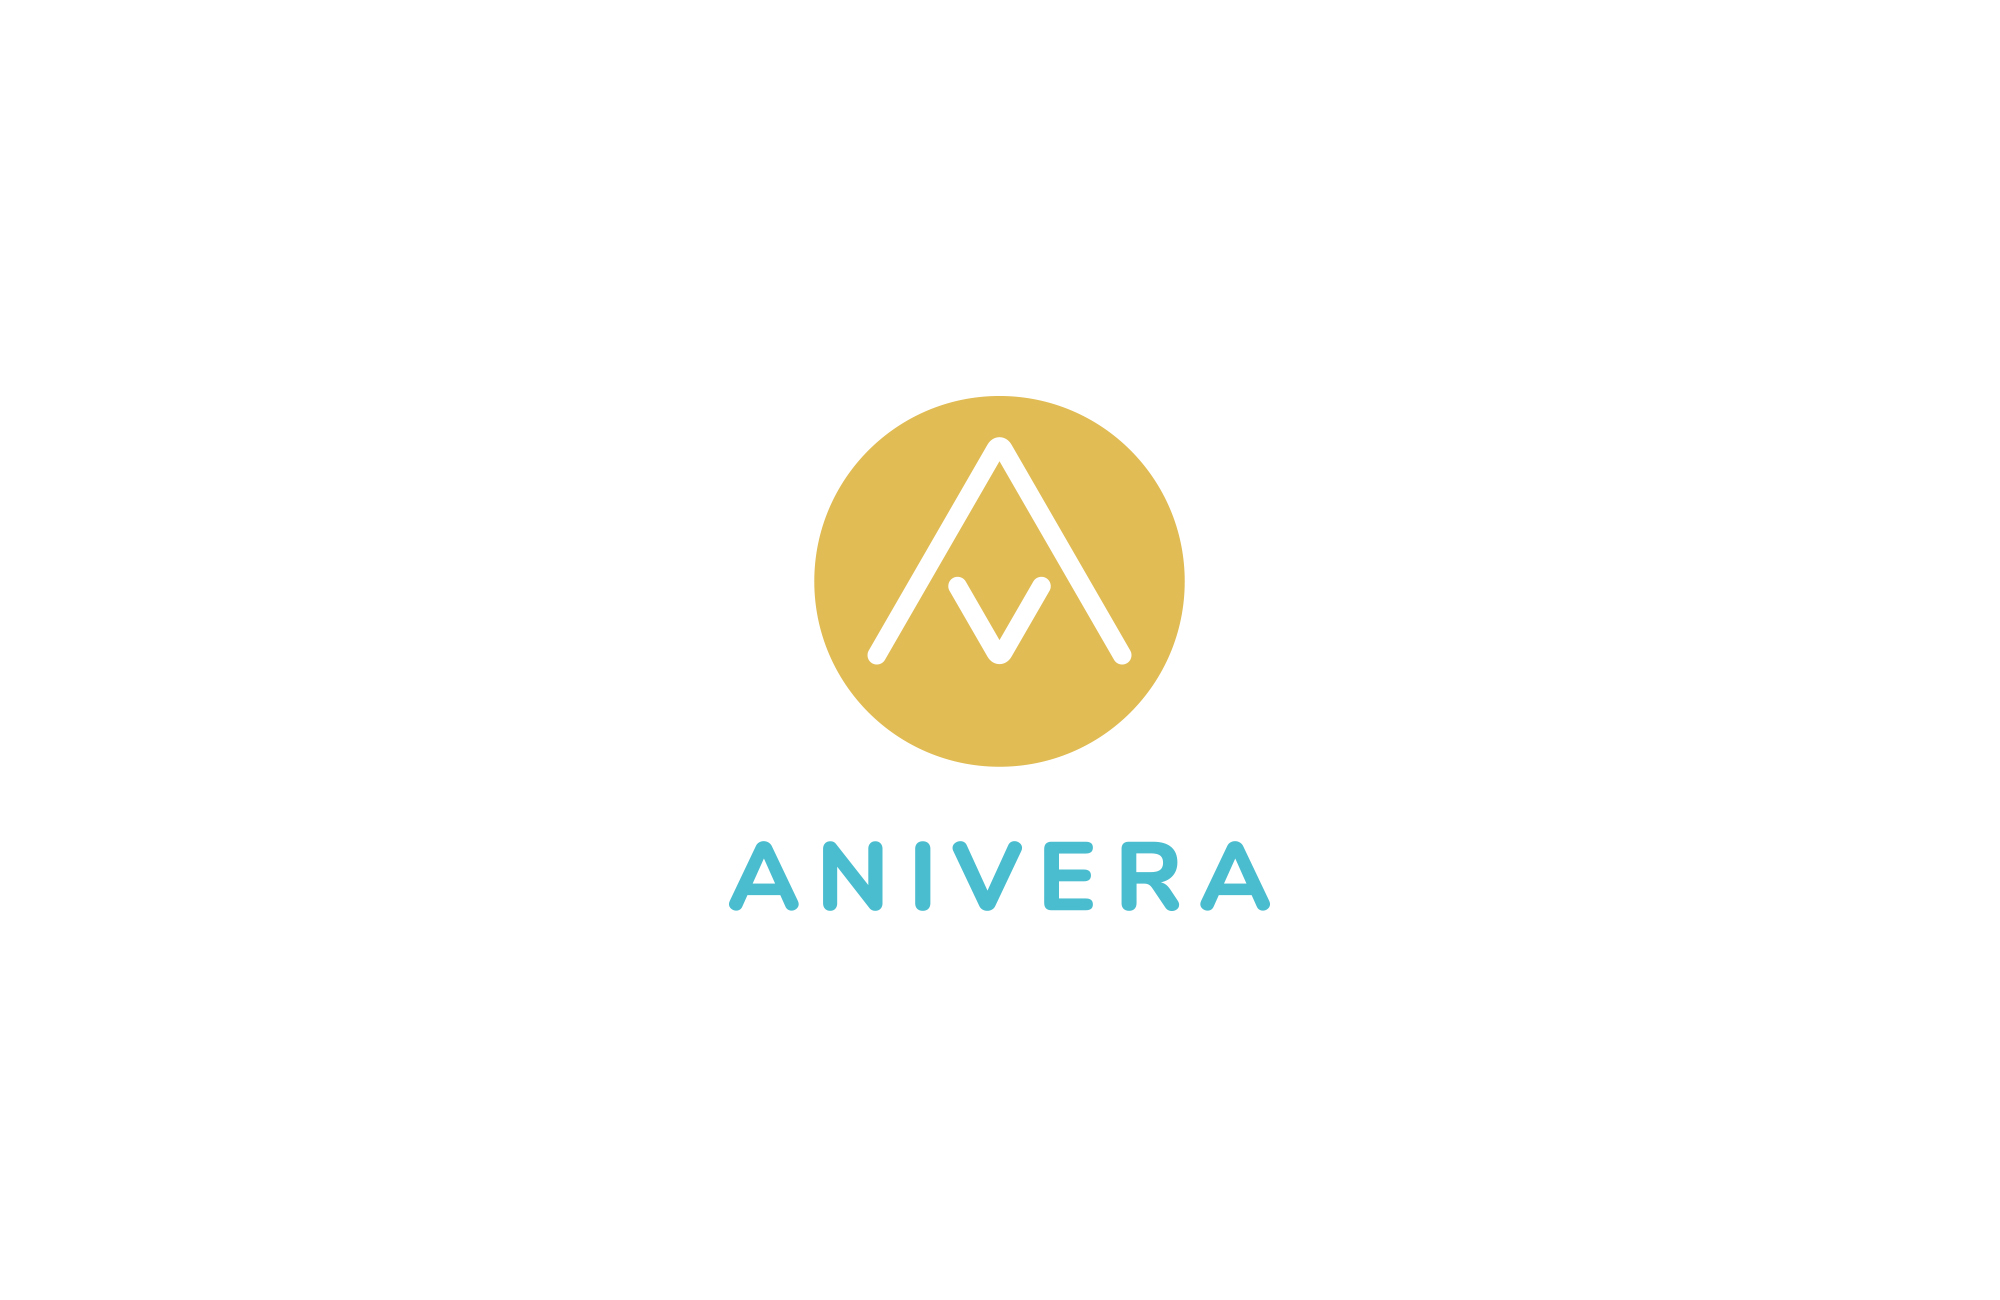 [album/Products_Model_Product/125/ANIVERA_logo_04.jpg]